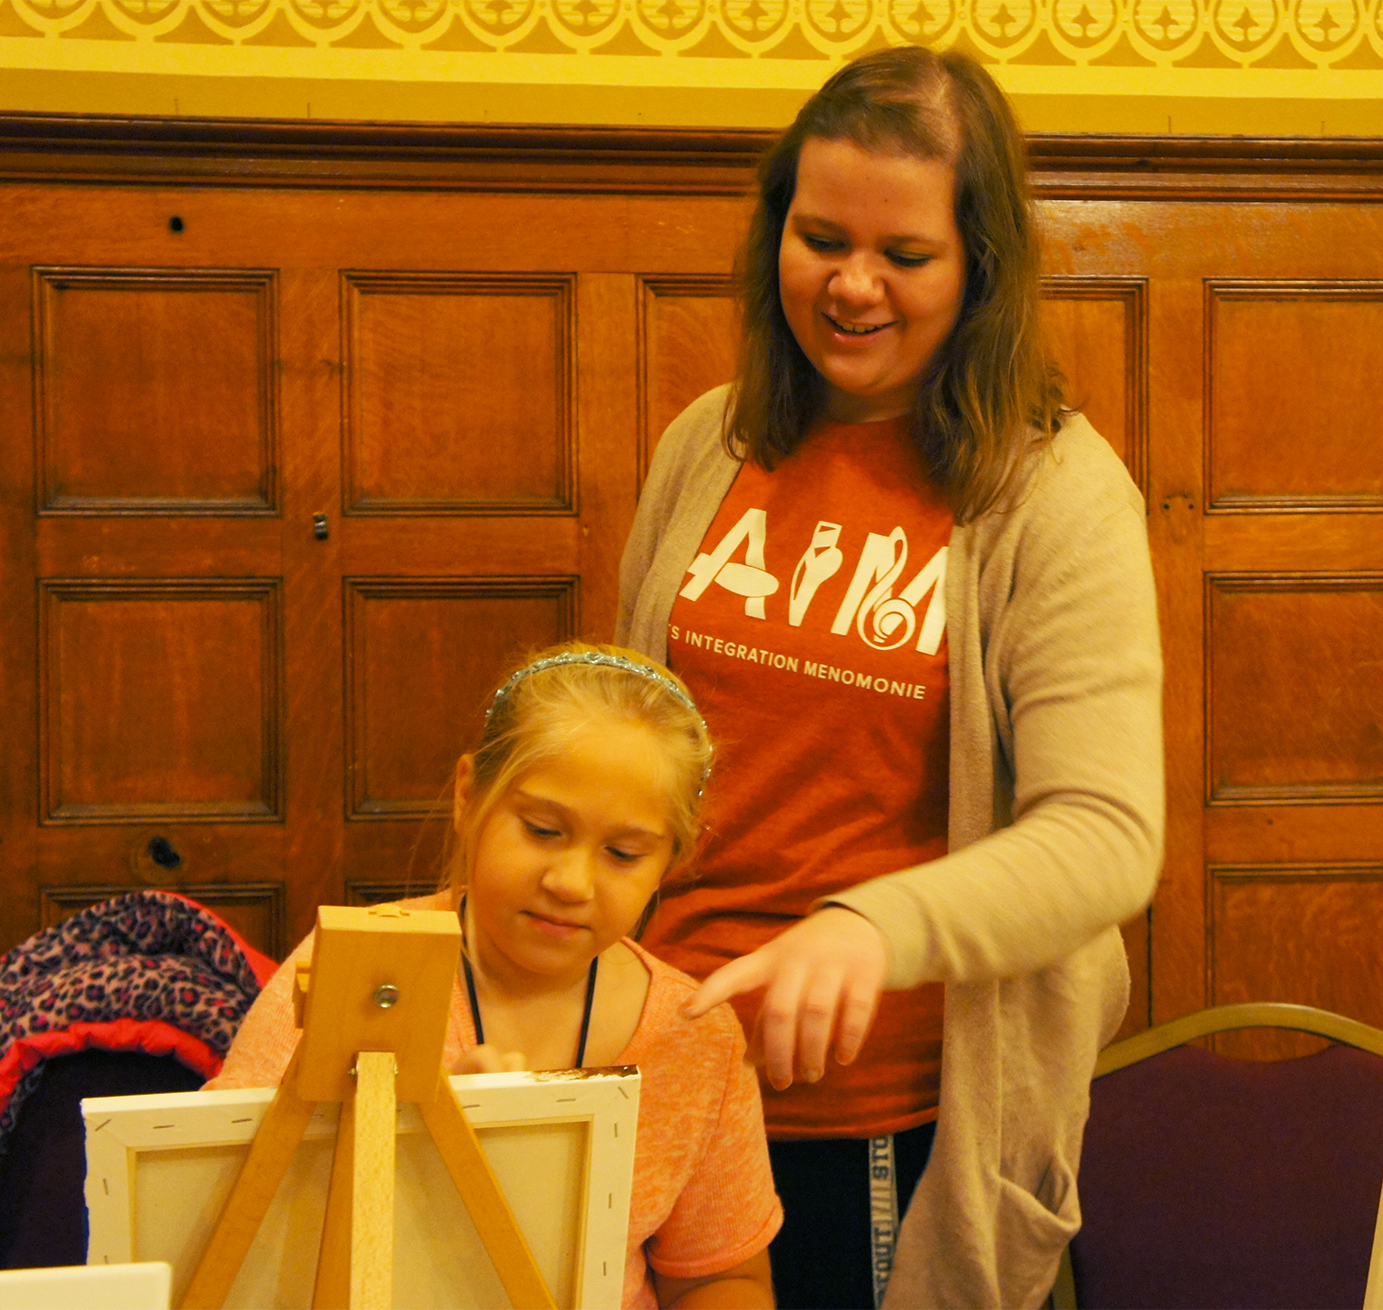 Nicole Seidler  UW-Stout Art Education INTERNSHIPS: 1) Canvas Fridays, Mabel Tainter Center for the Arts  2) Mosaic Sundays, UW-Stout Library